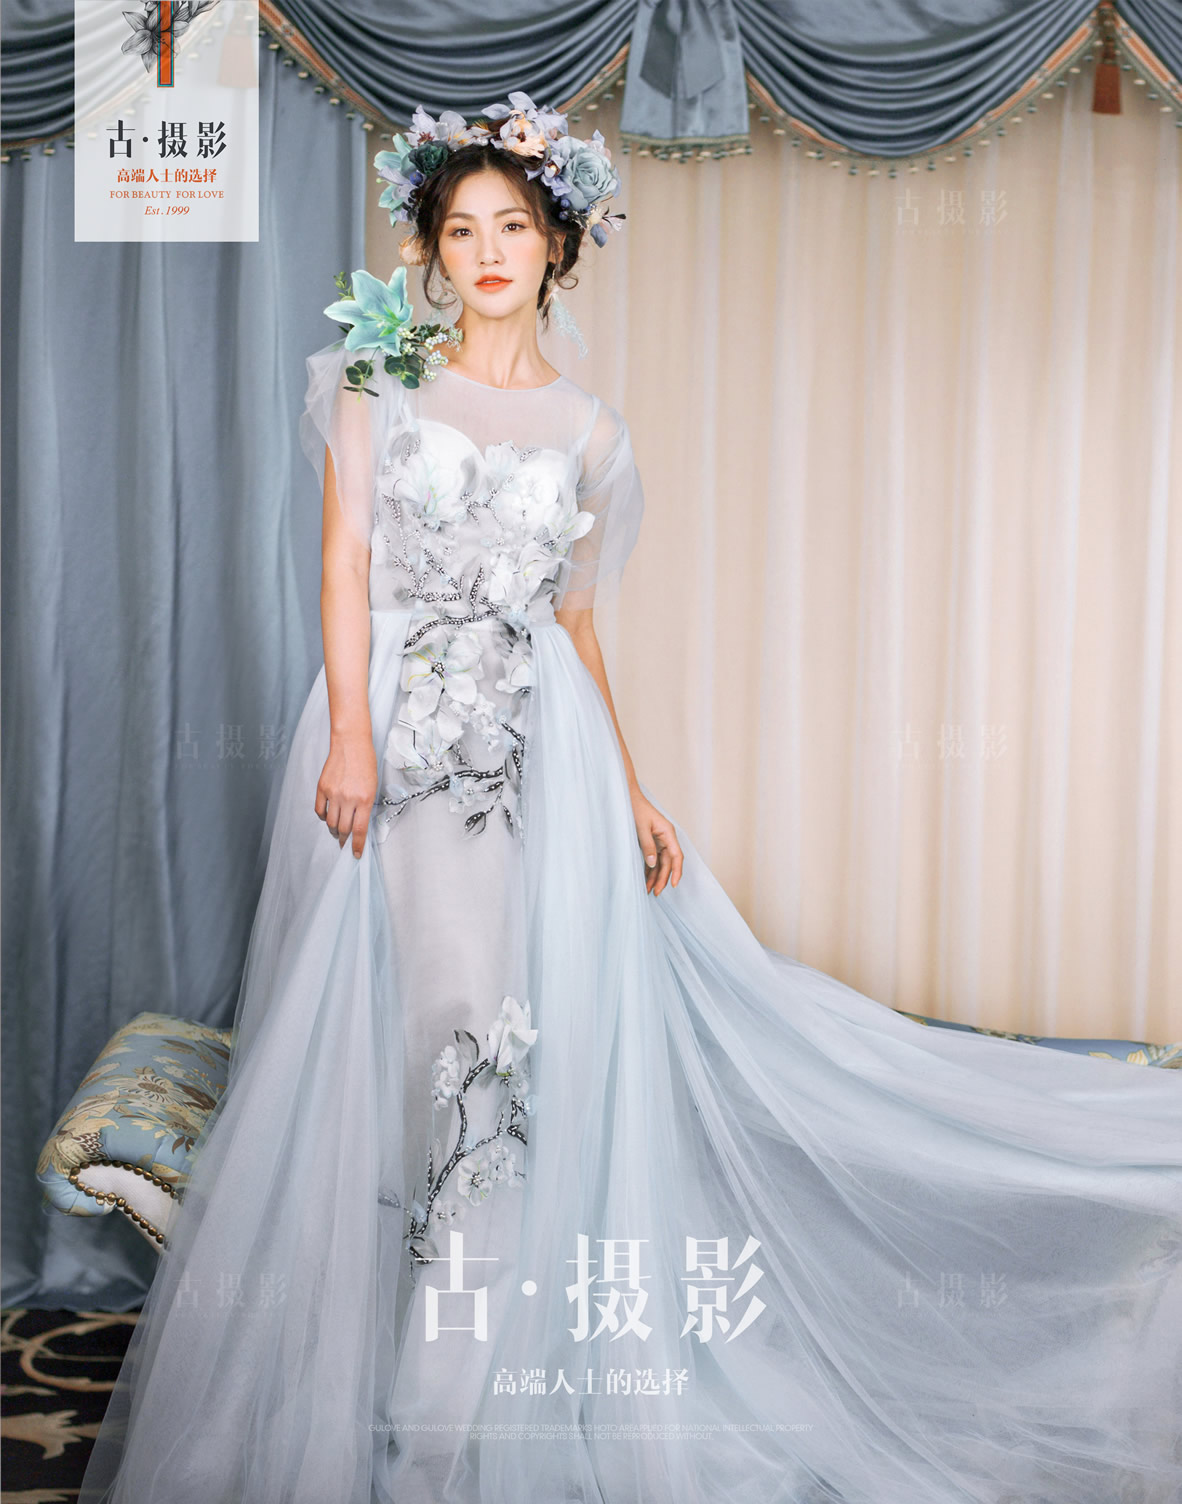 GRACE Ⅲ - 明星范 - 古摄影婚纱艺术-古摄影成都婚纱摄影艺术摄影网